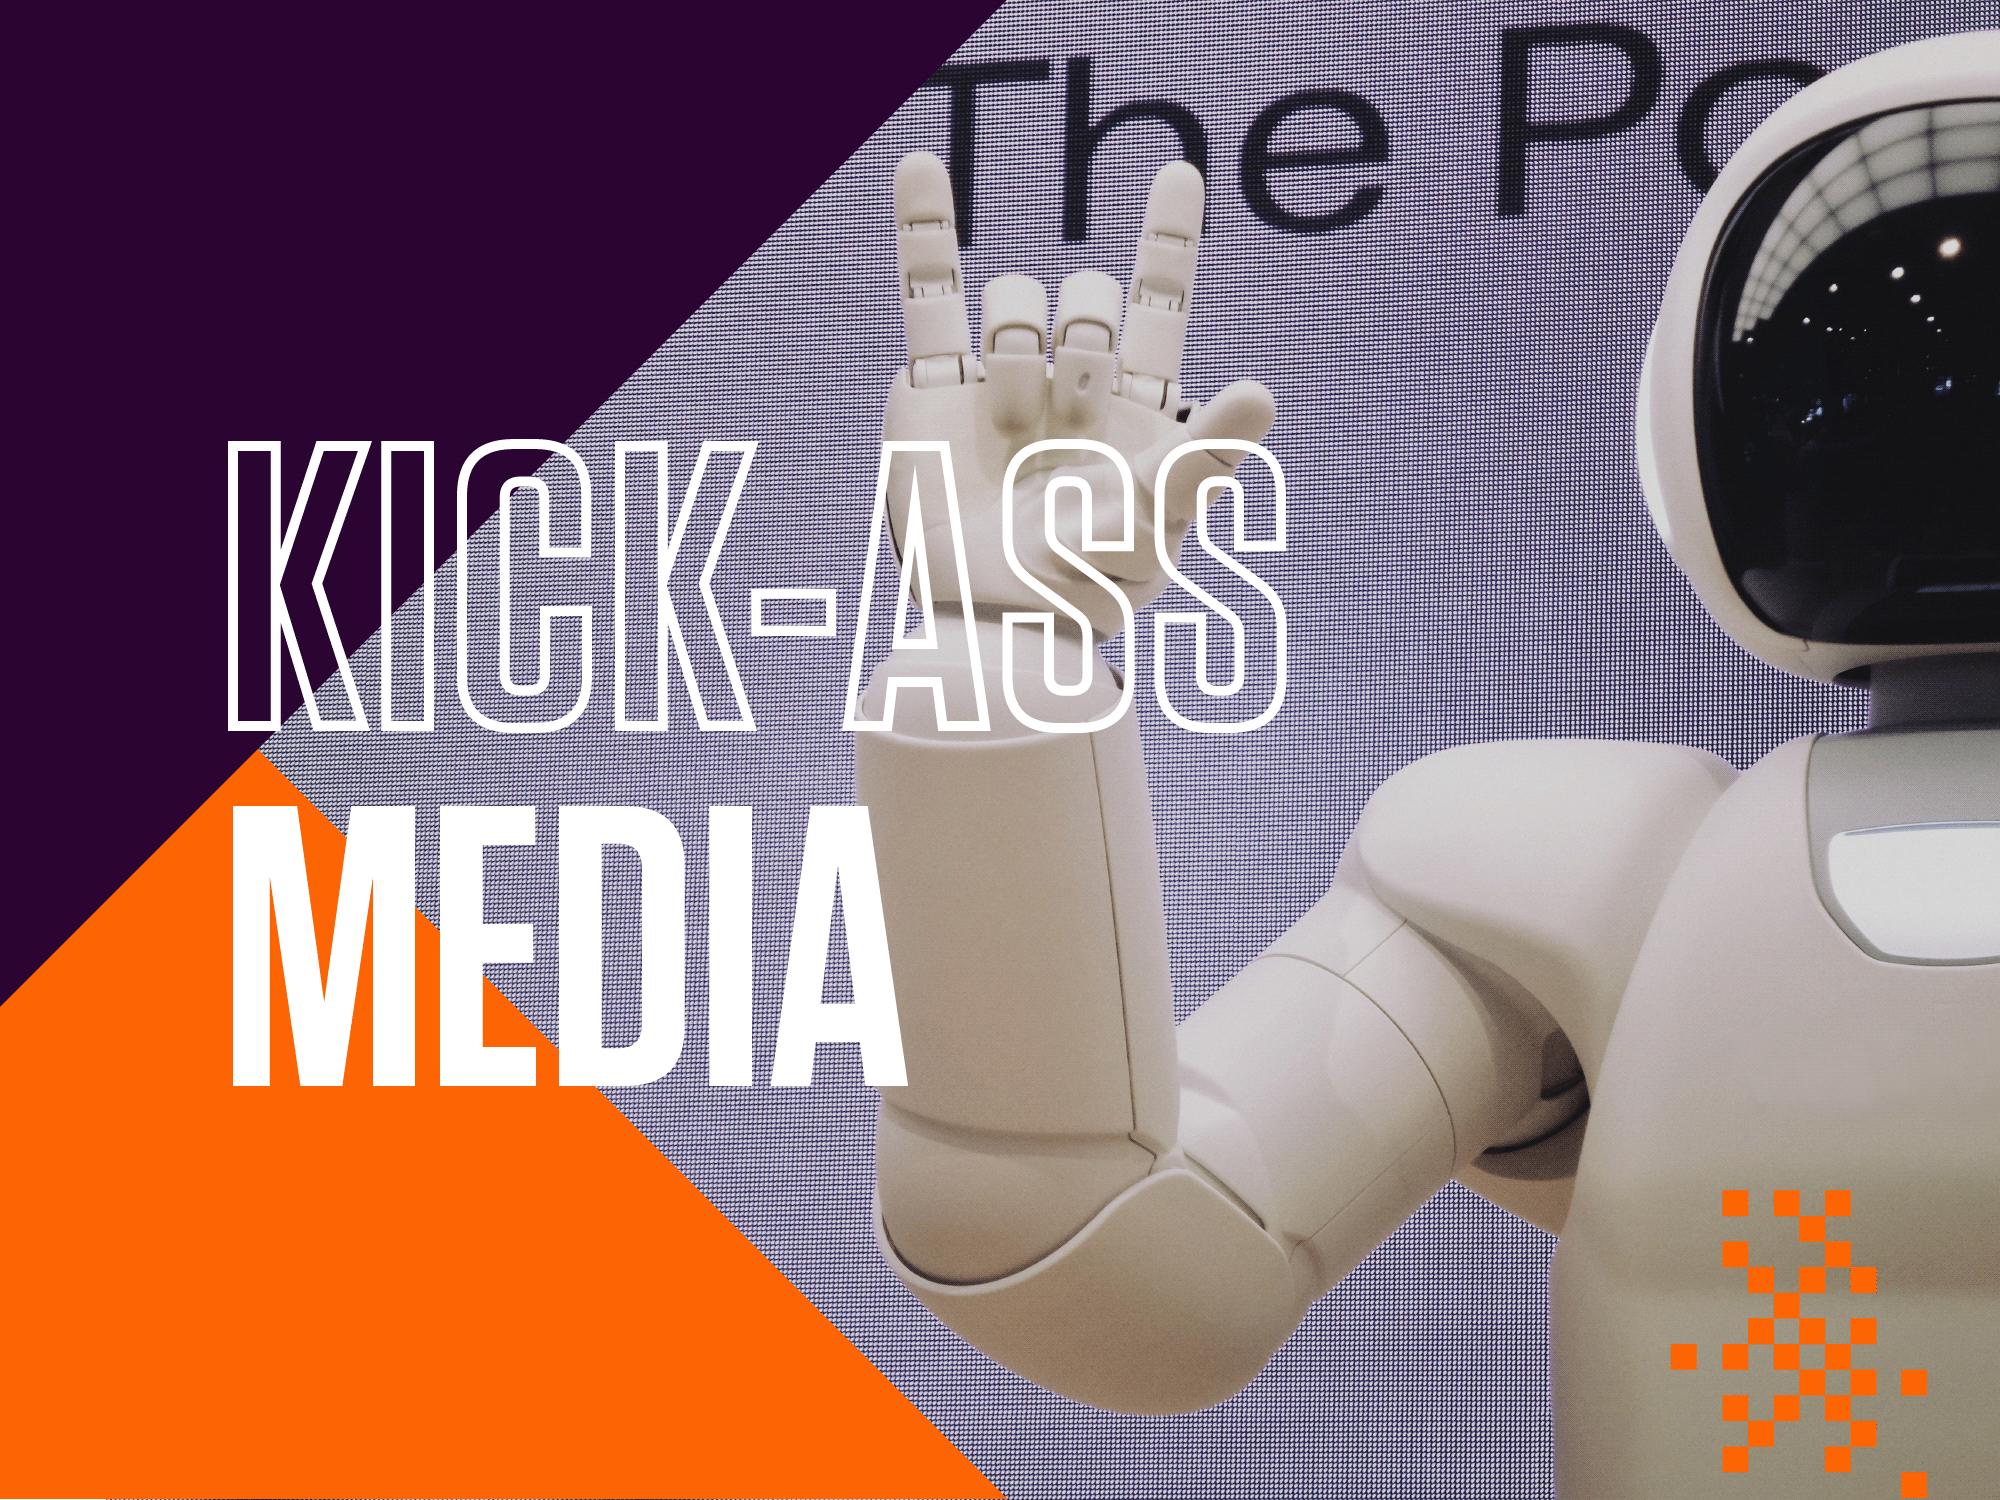 Thumb_kick-as_media-website.png